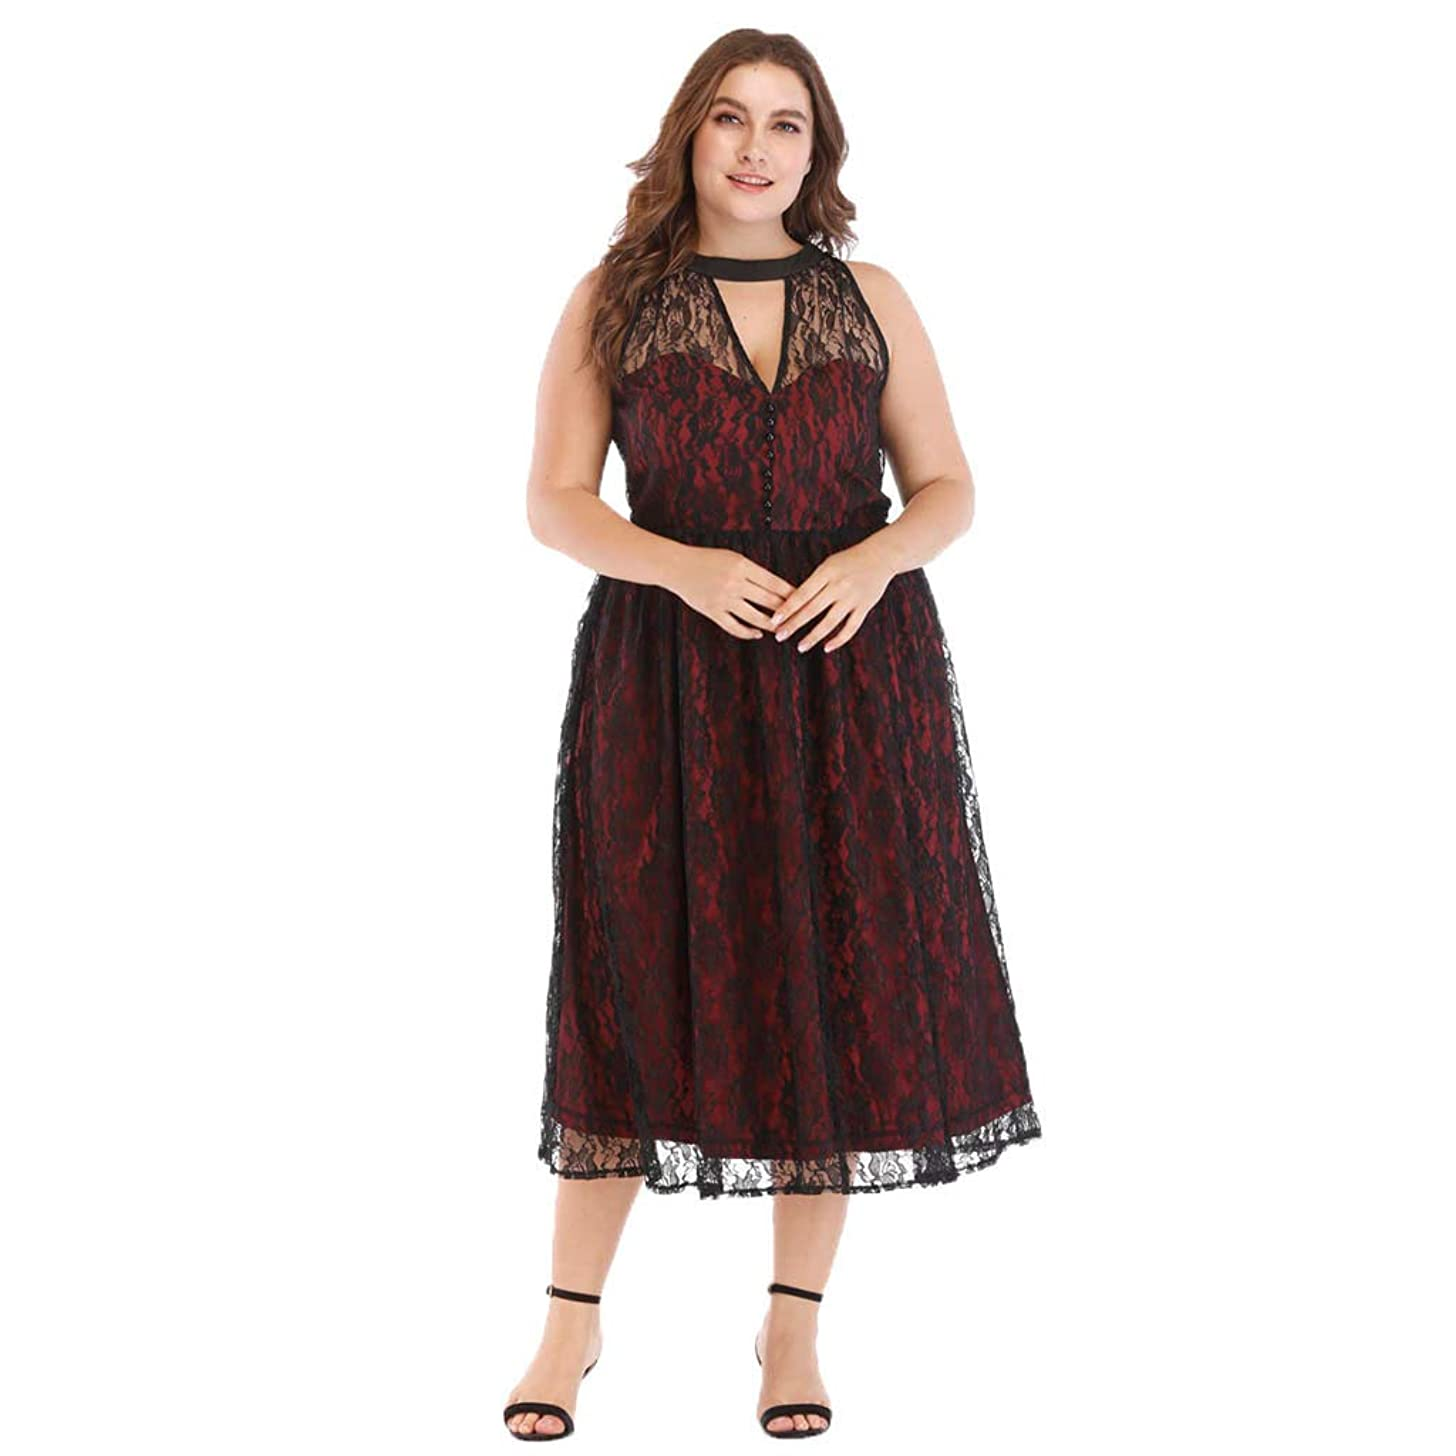 Mikilon Plus Size Embroidery Dress for Women Button Up V Neck Floral Lace Midi Dress